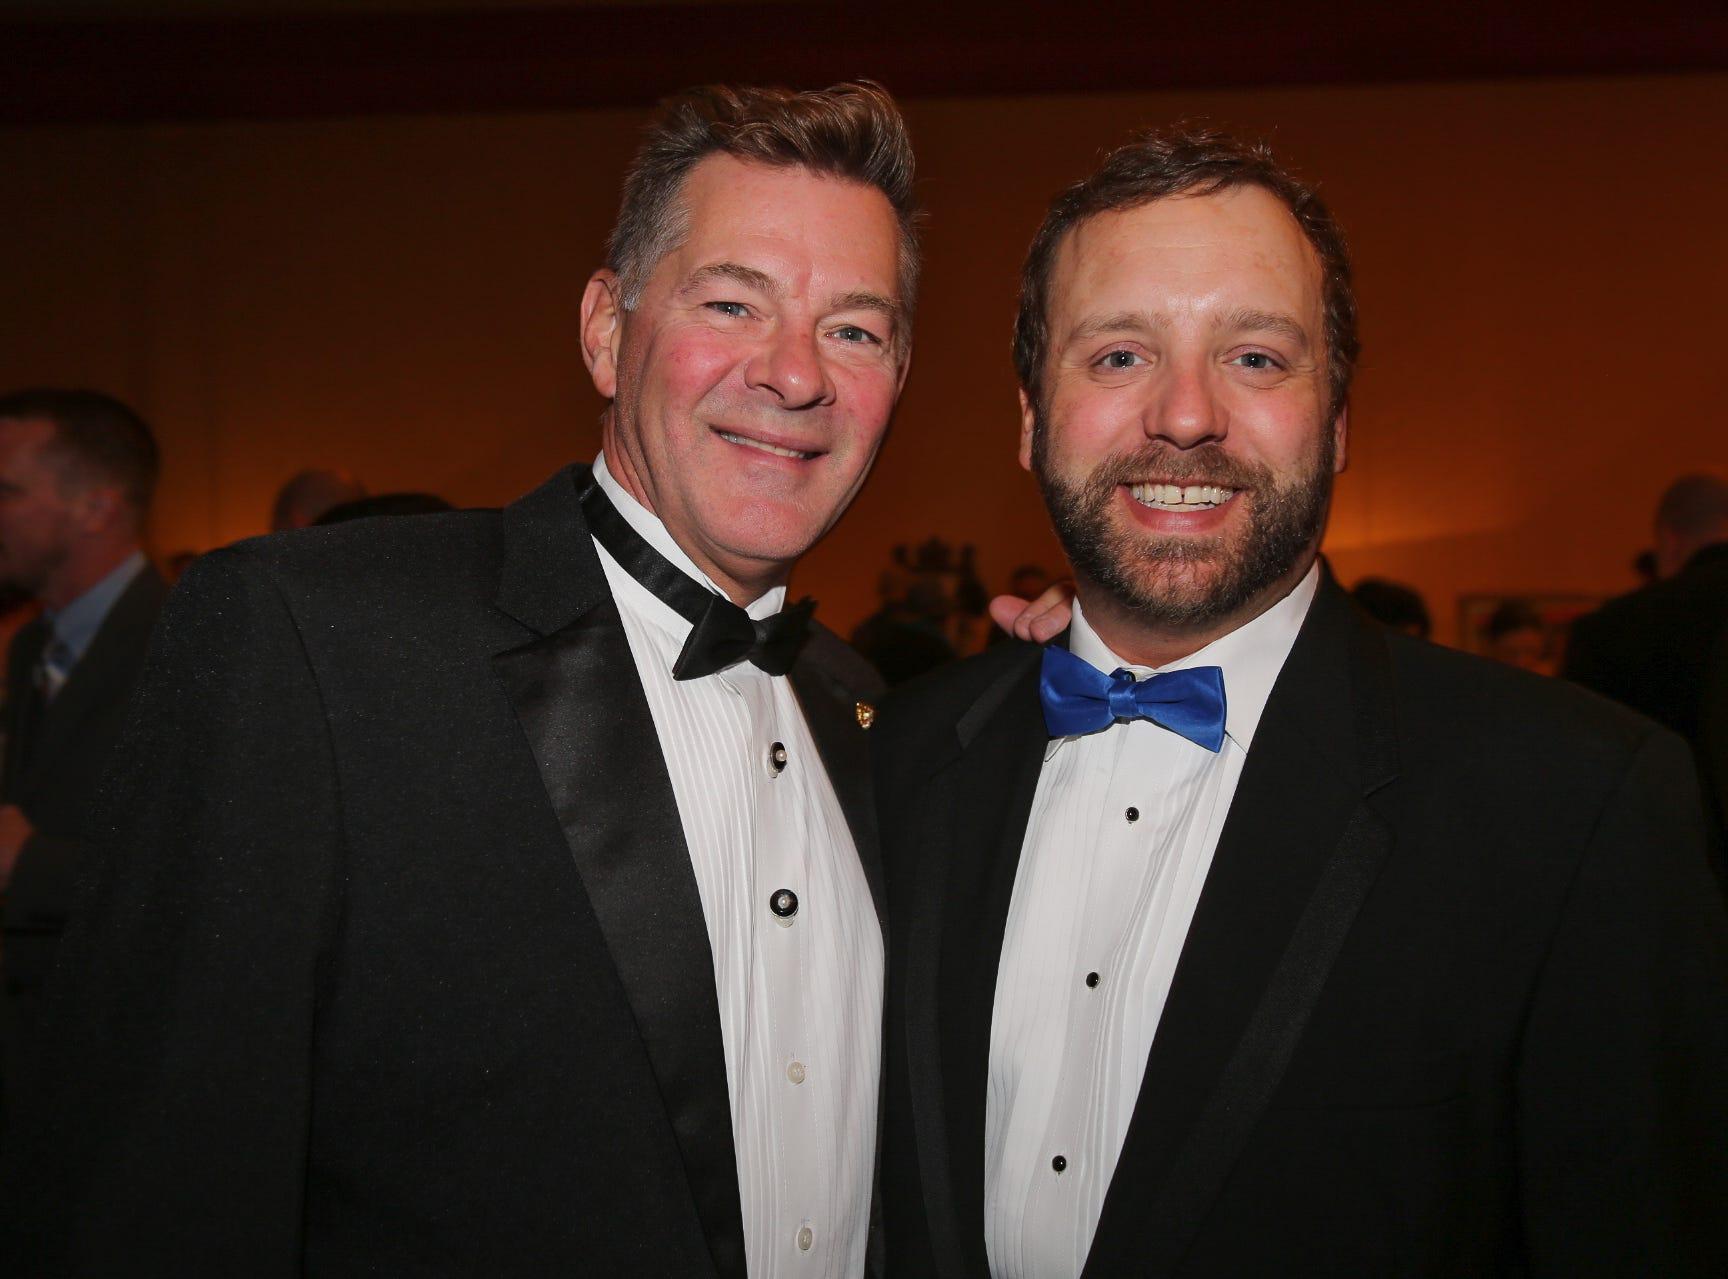 Jerry Osborn and Joe Langhorst